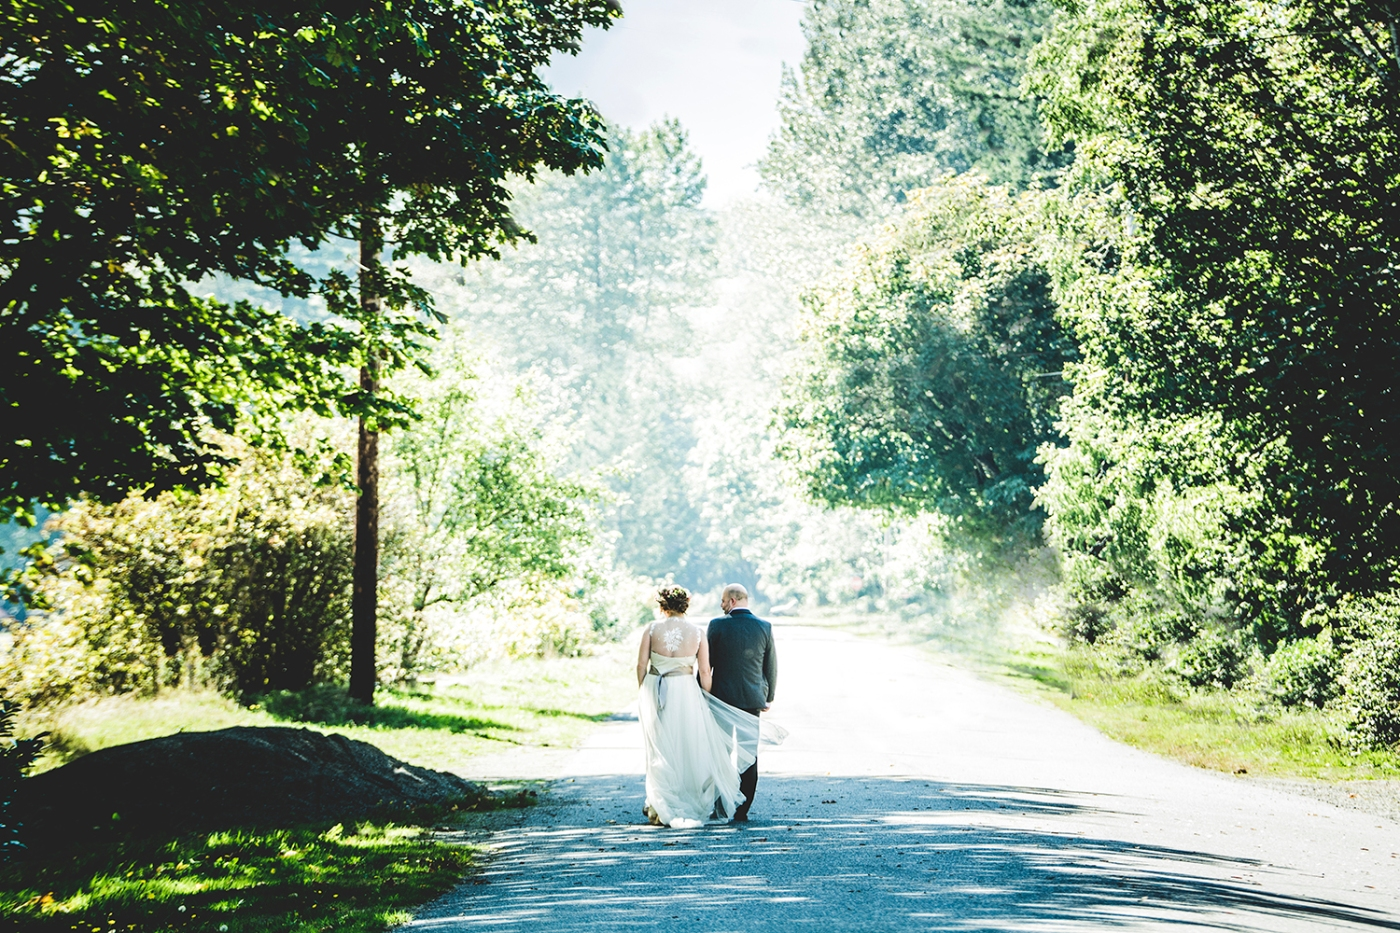 M&R River House Italian Wedding 2015DSC_4116